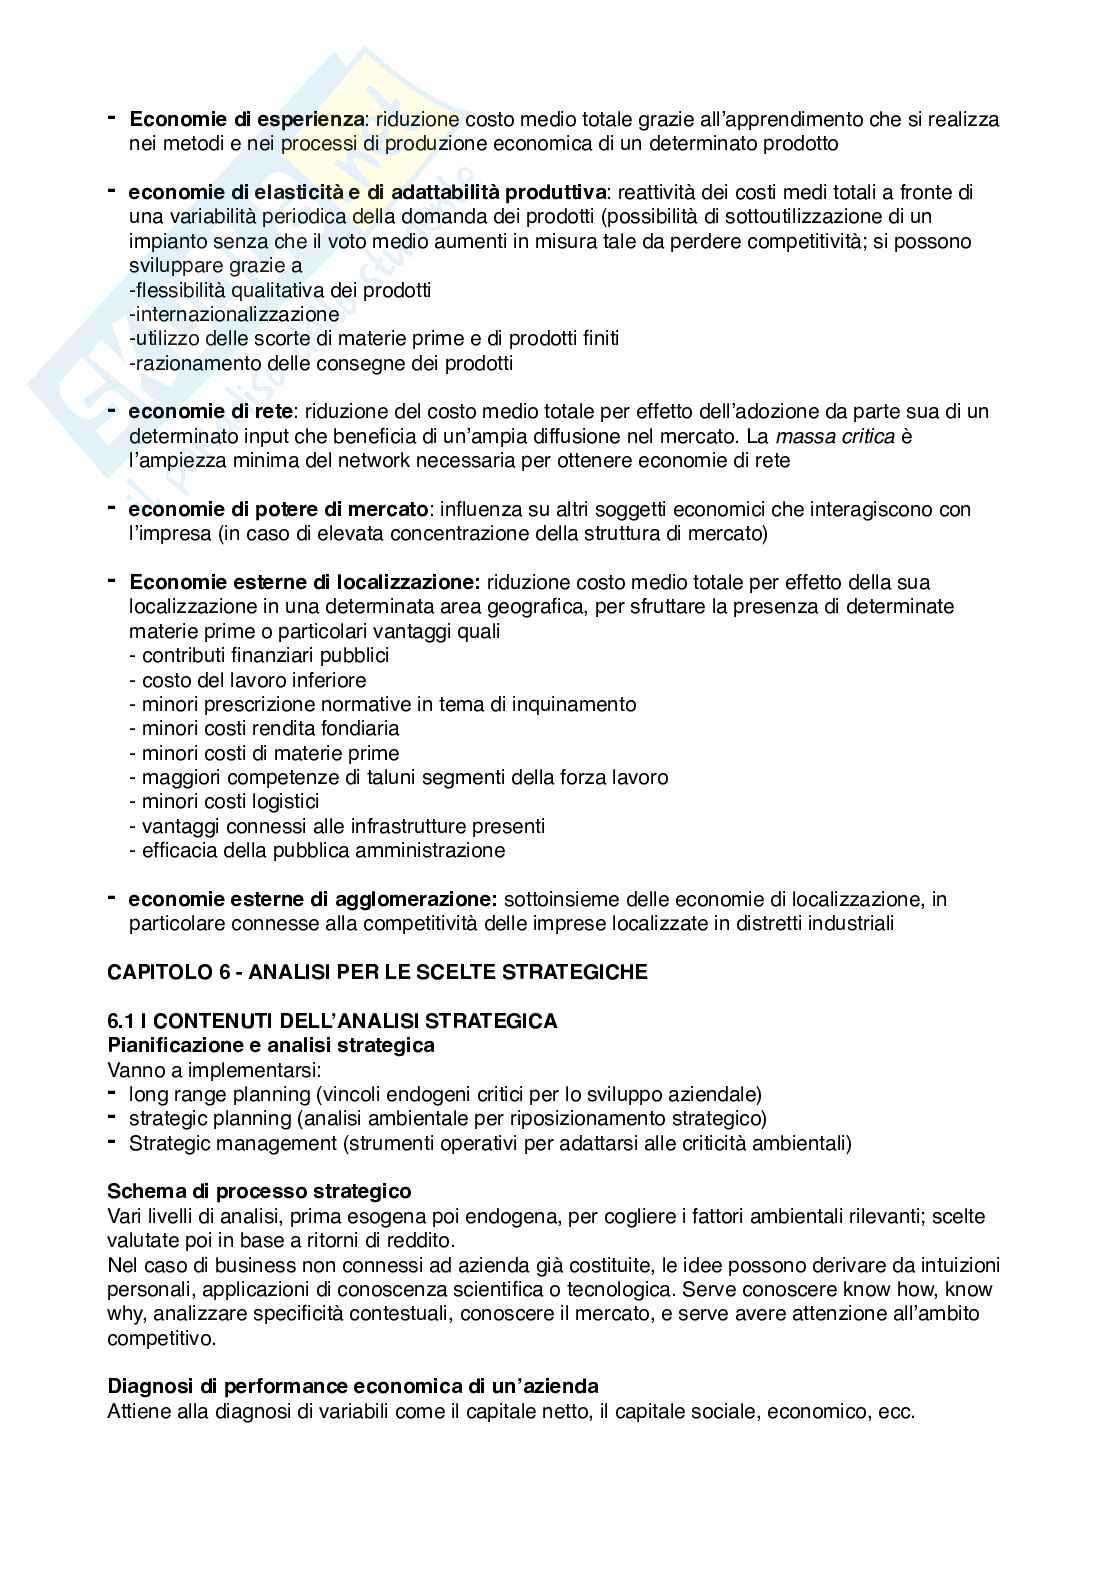 Management - Riassunto lezioni Pag. 16